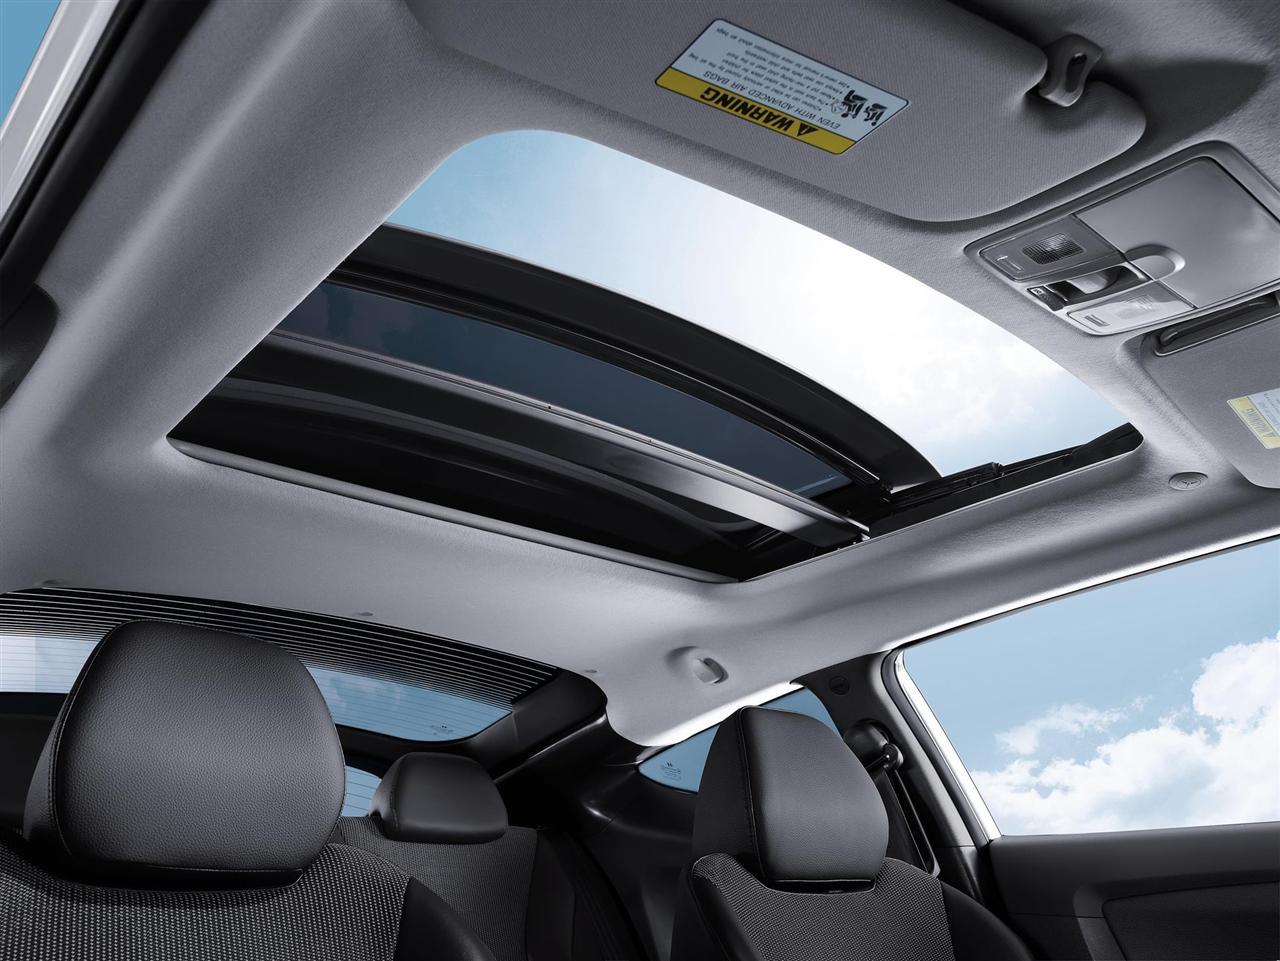 2015 Hyundai Veloster Image Https Www Conceptcarz Com